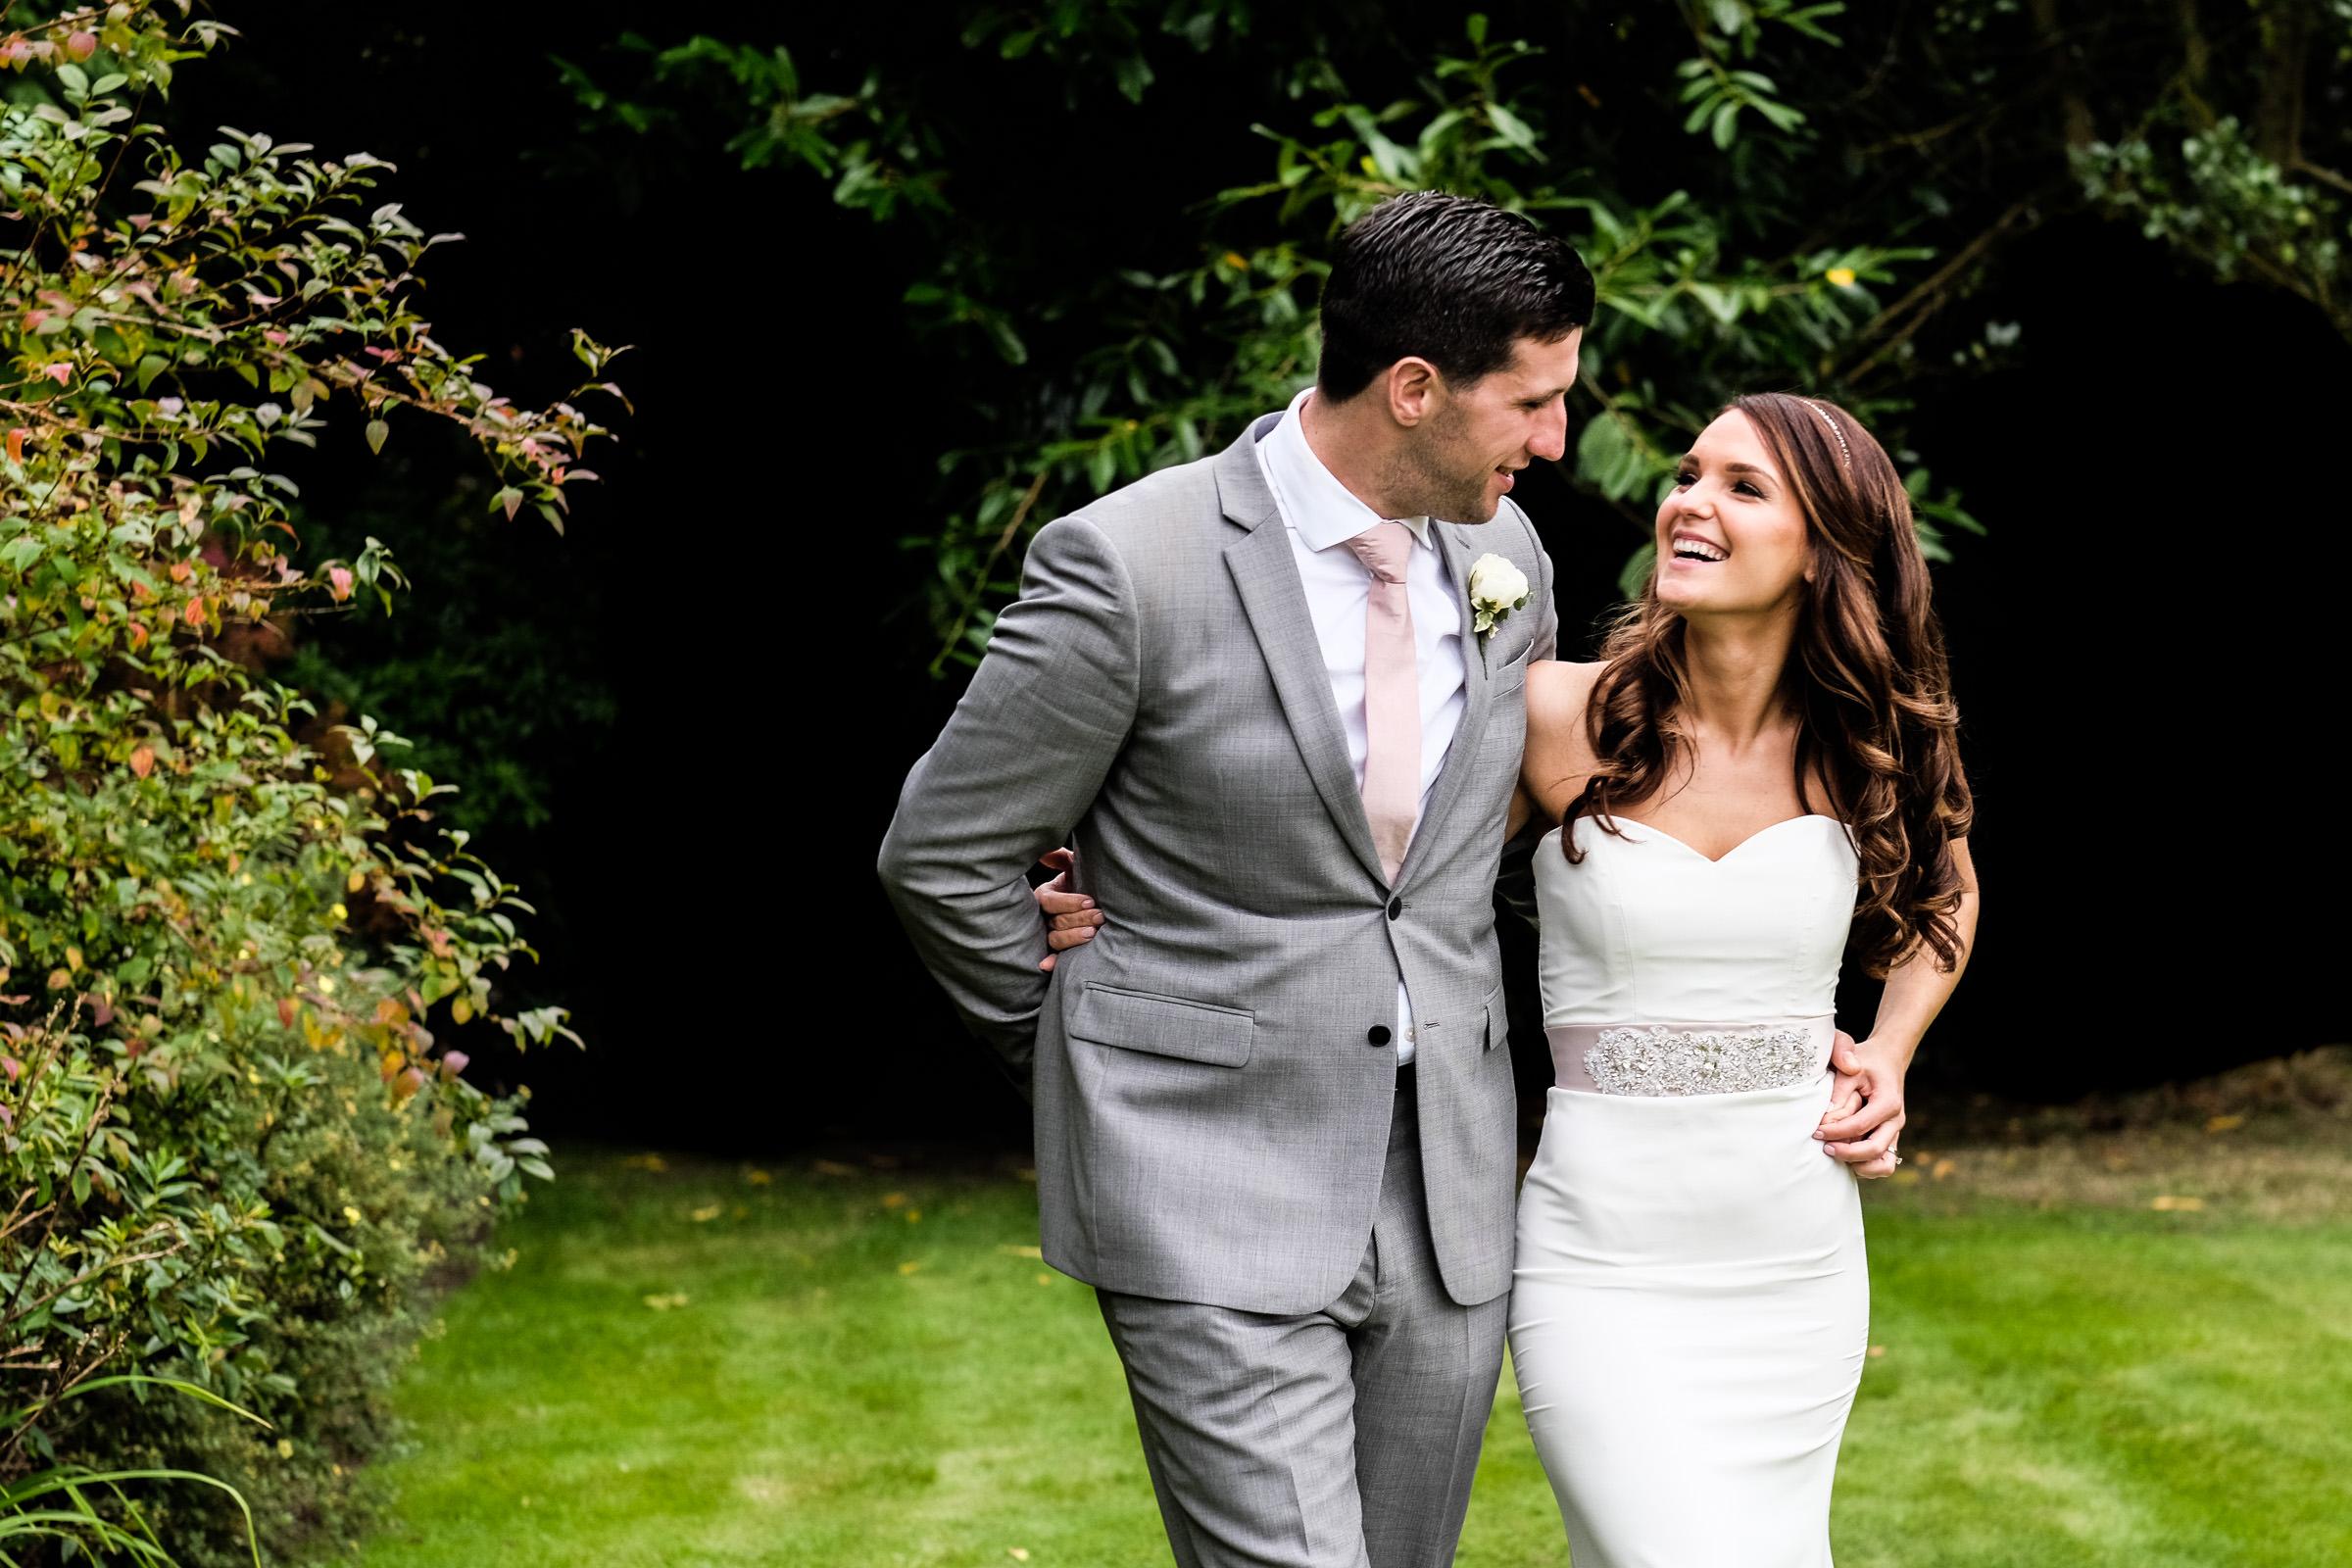 Wedding+Photography+Surrey+014.jpg